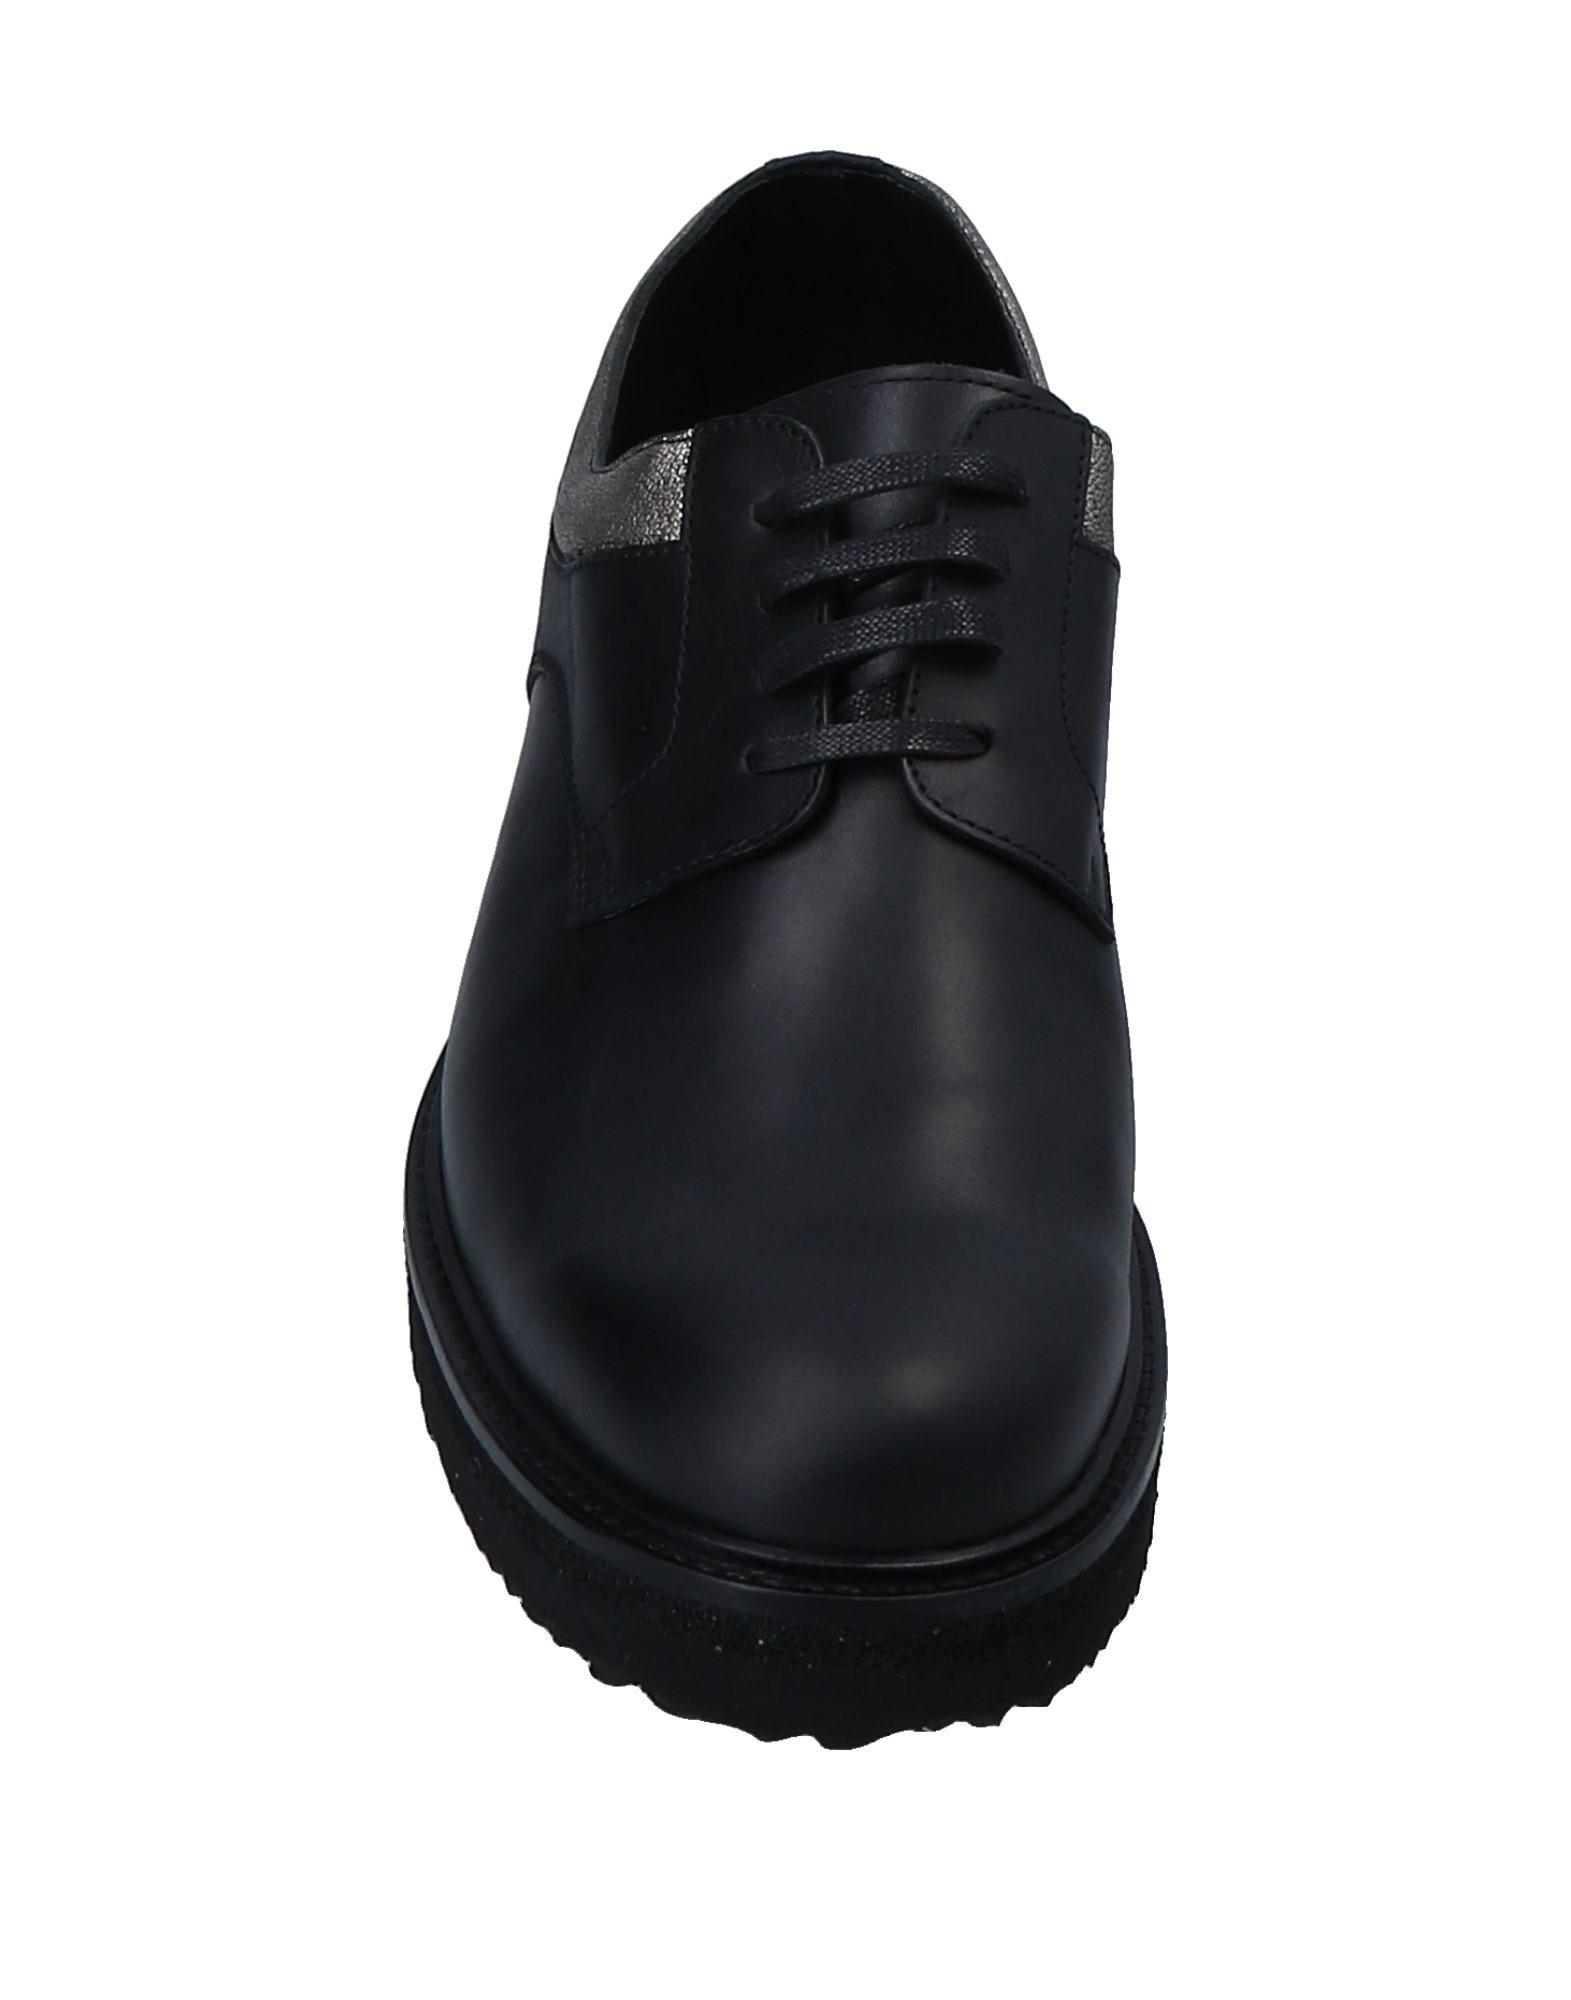 Stilvolle billige Schuhe Seboy's Schnürschuhe 11556877CI Damen  11556877CI Schnürschuhe d4104f